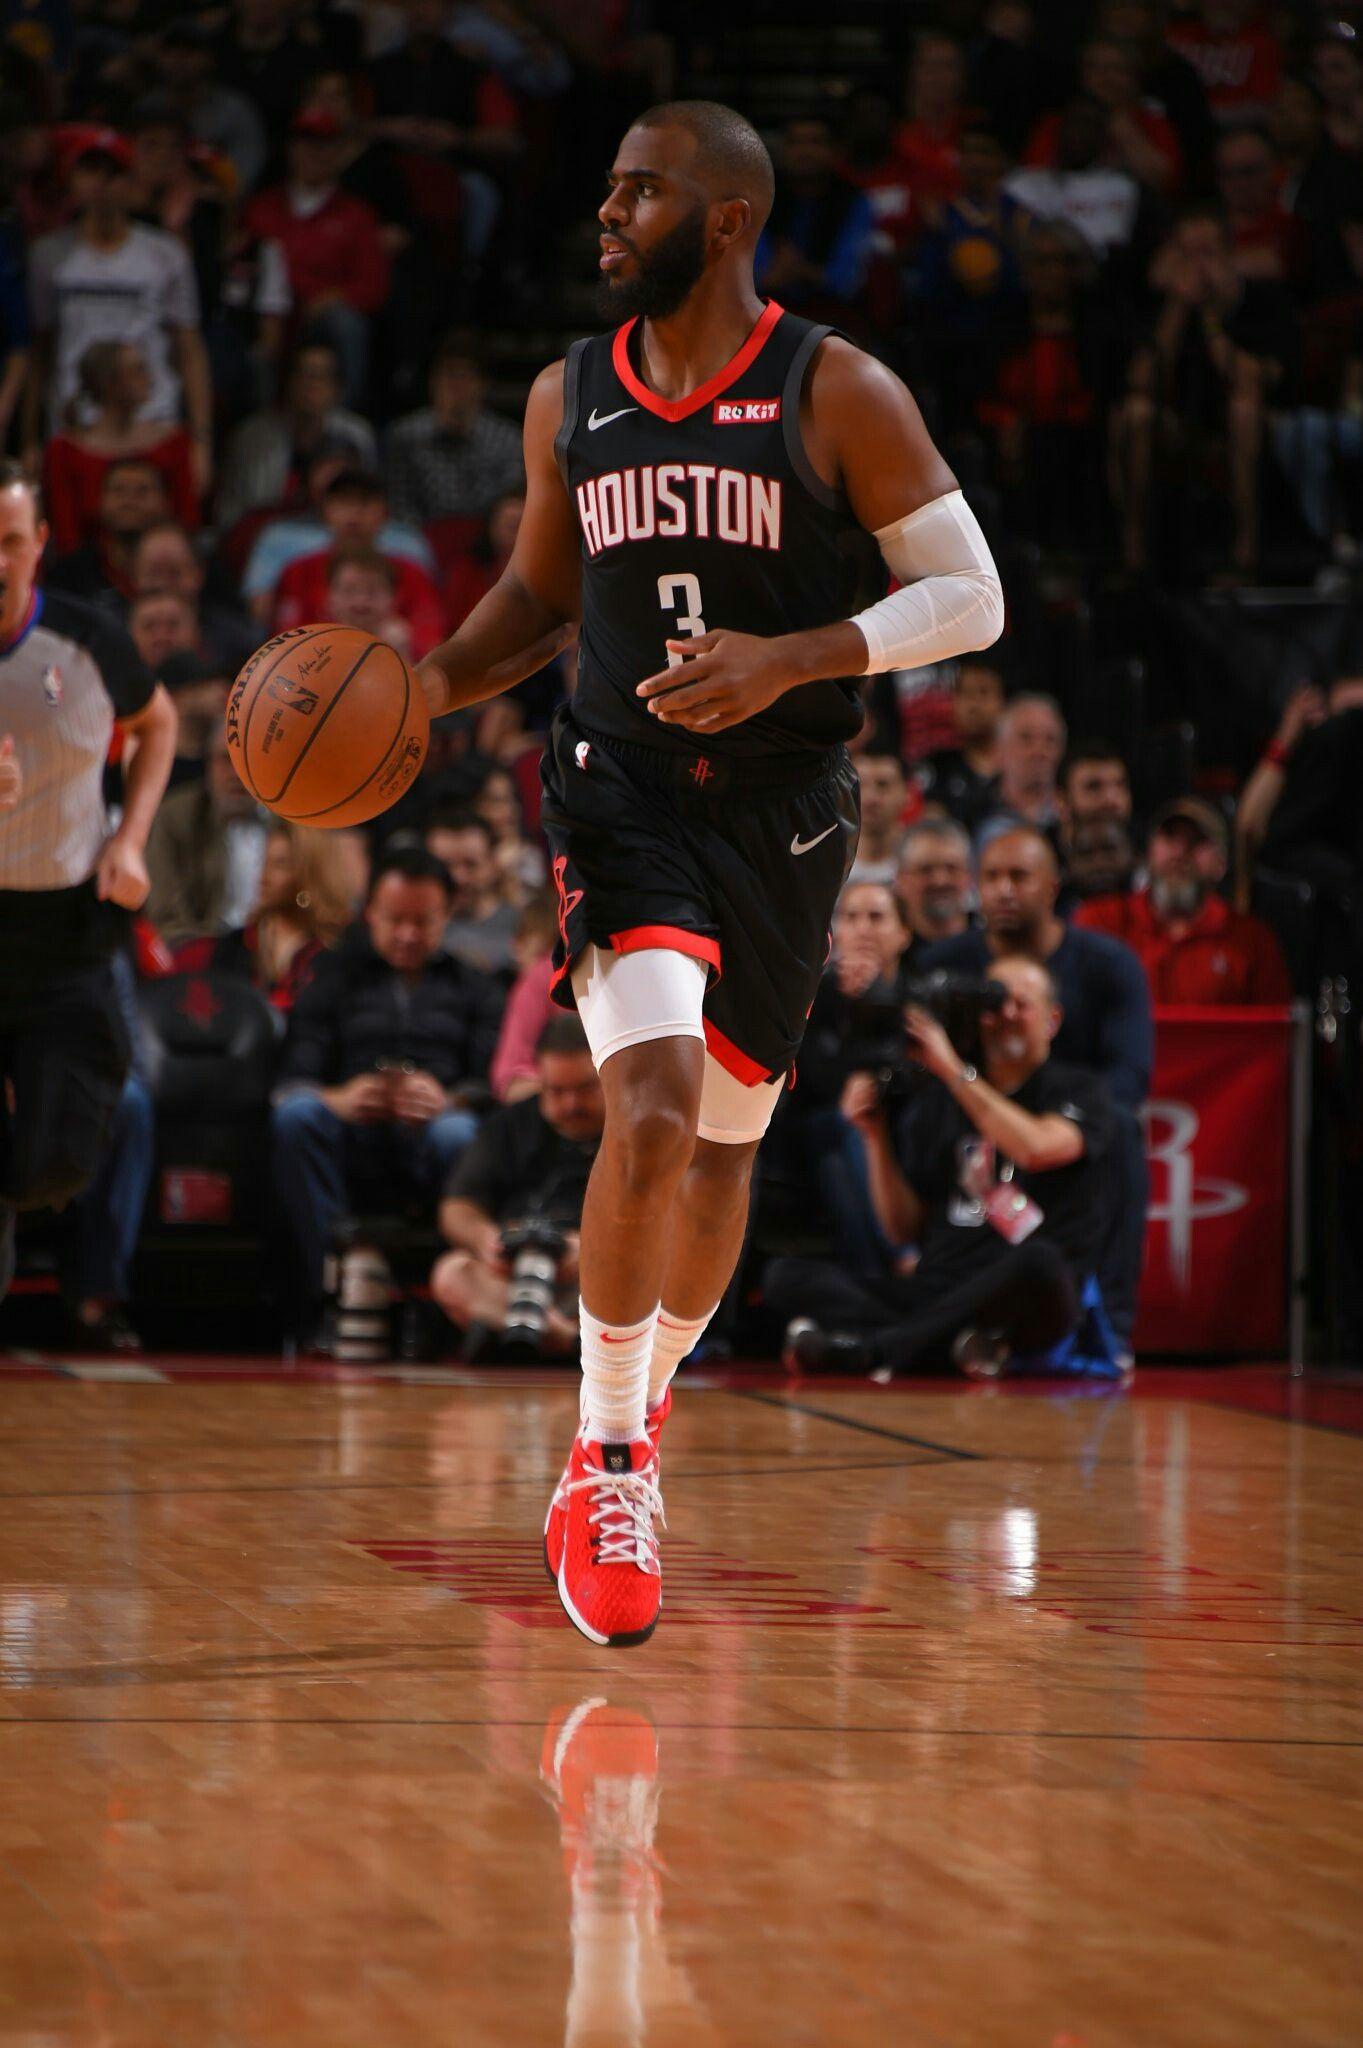 Pin By Ameera On Nba Basketball Players Houston Rockets Chris Paul